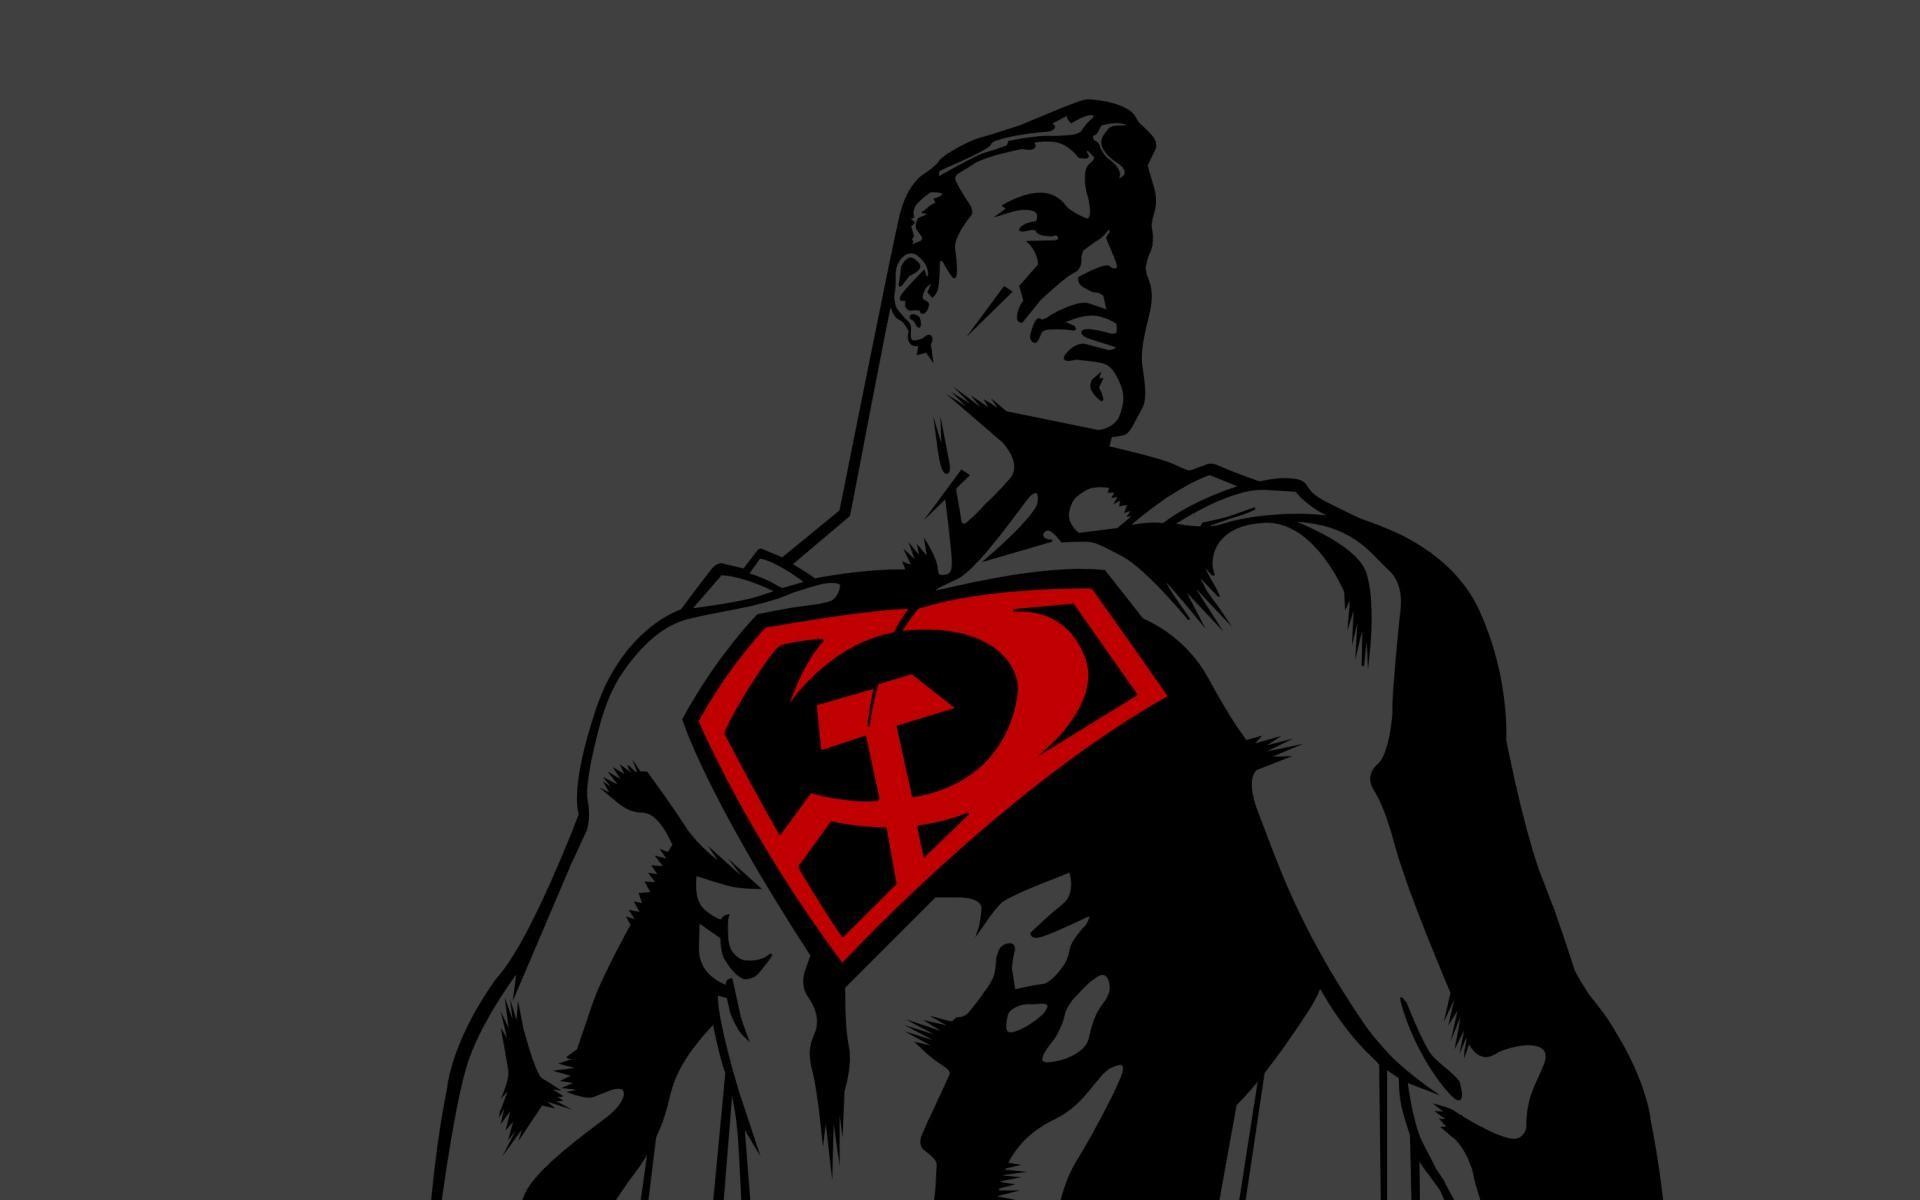 fond d 39 cran illustration monochrome dessin anim dc comics des bandes dessin es superman. Black Bedroom Furniture Sets. Home Design Ideas